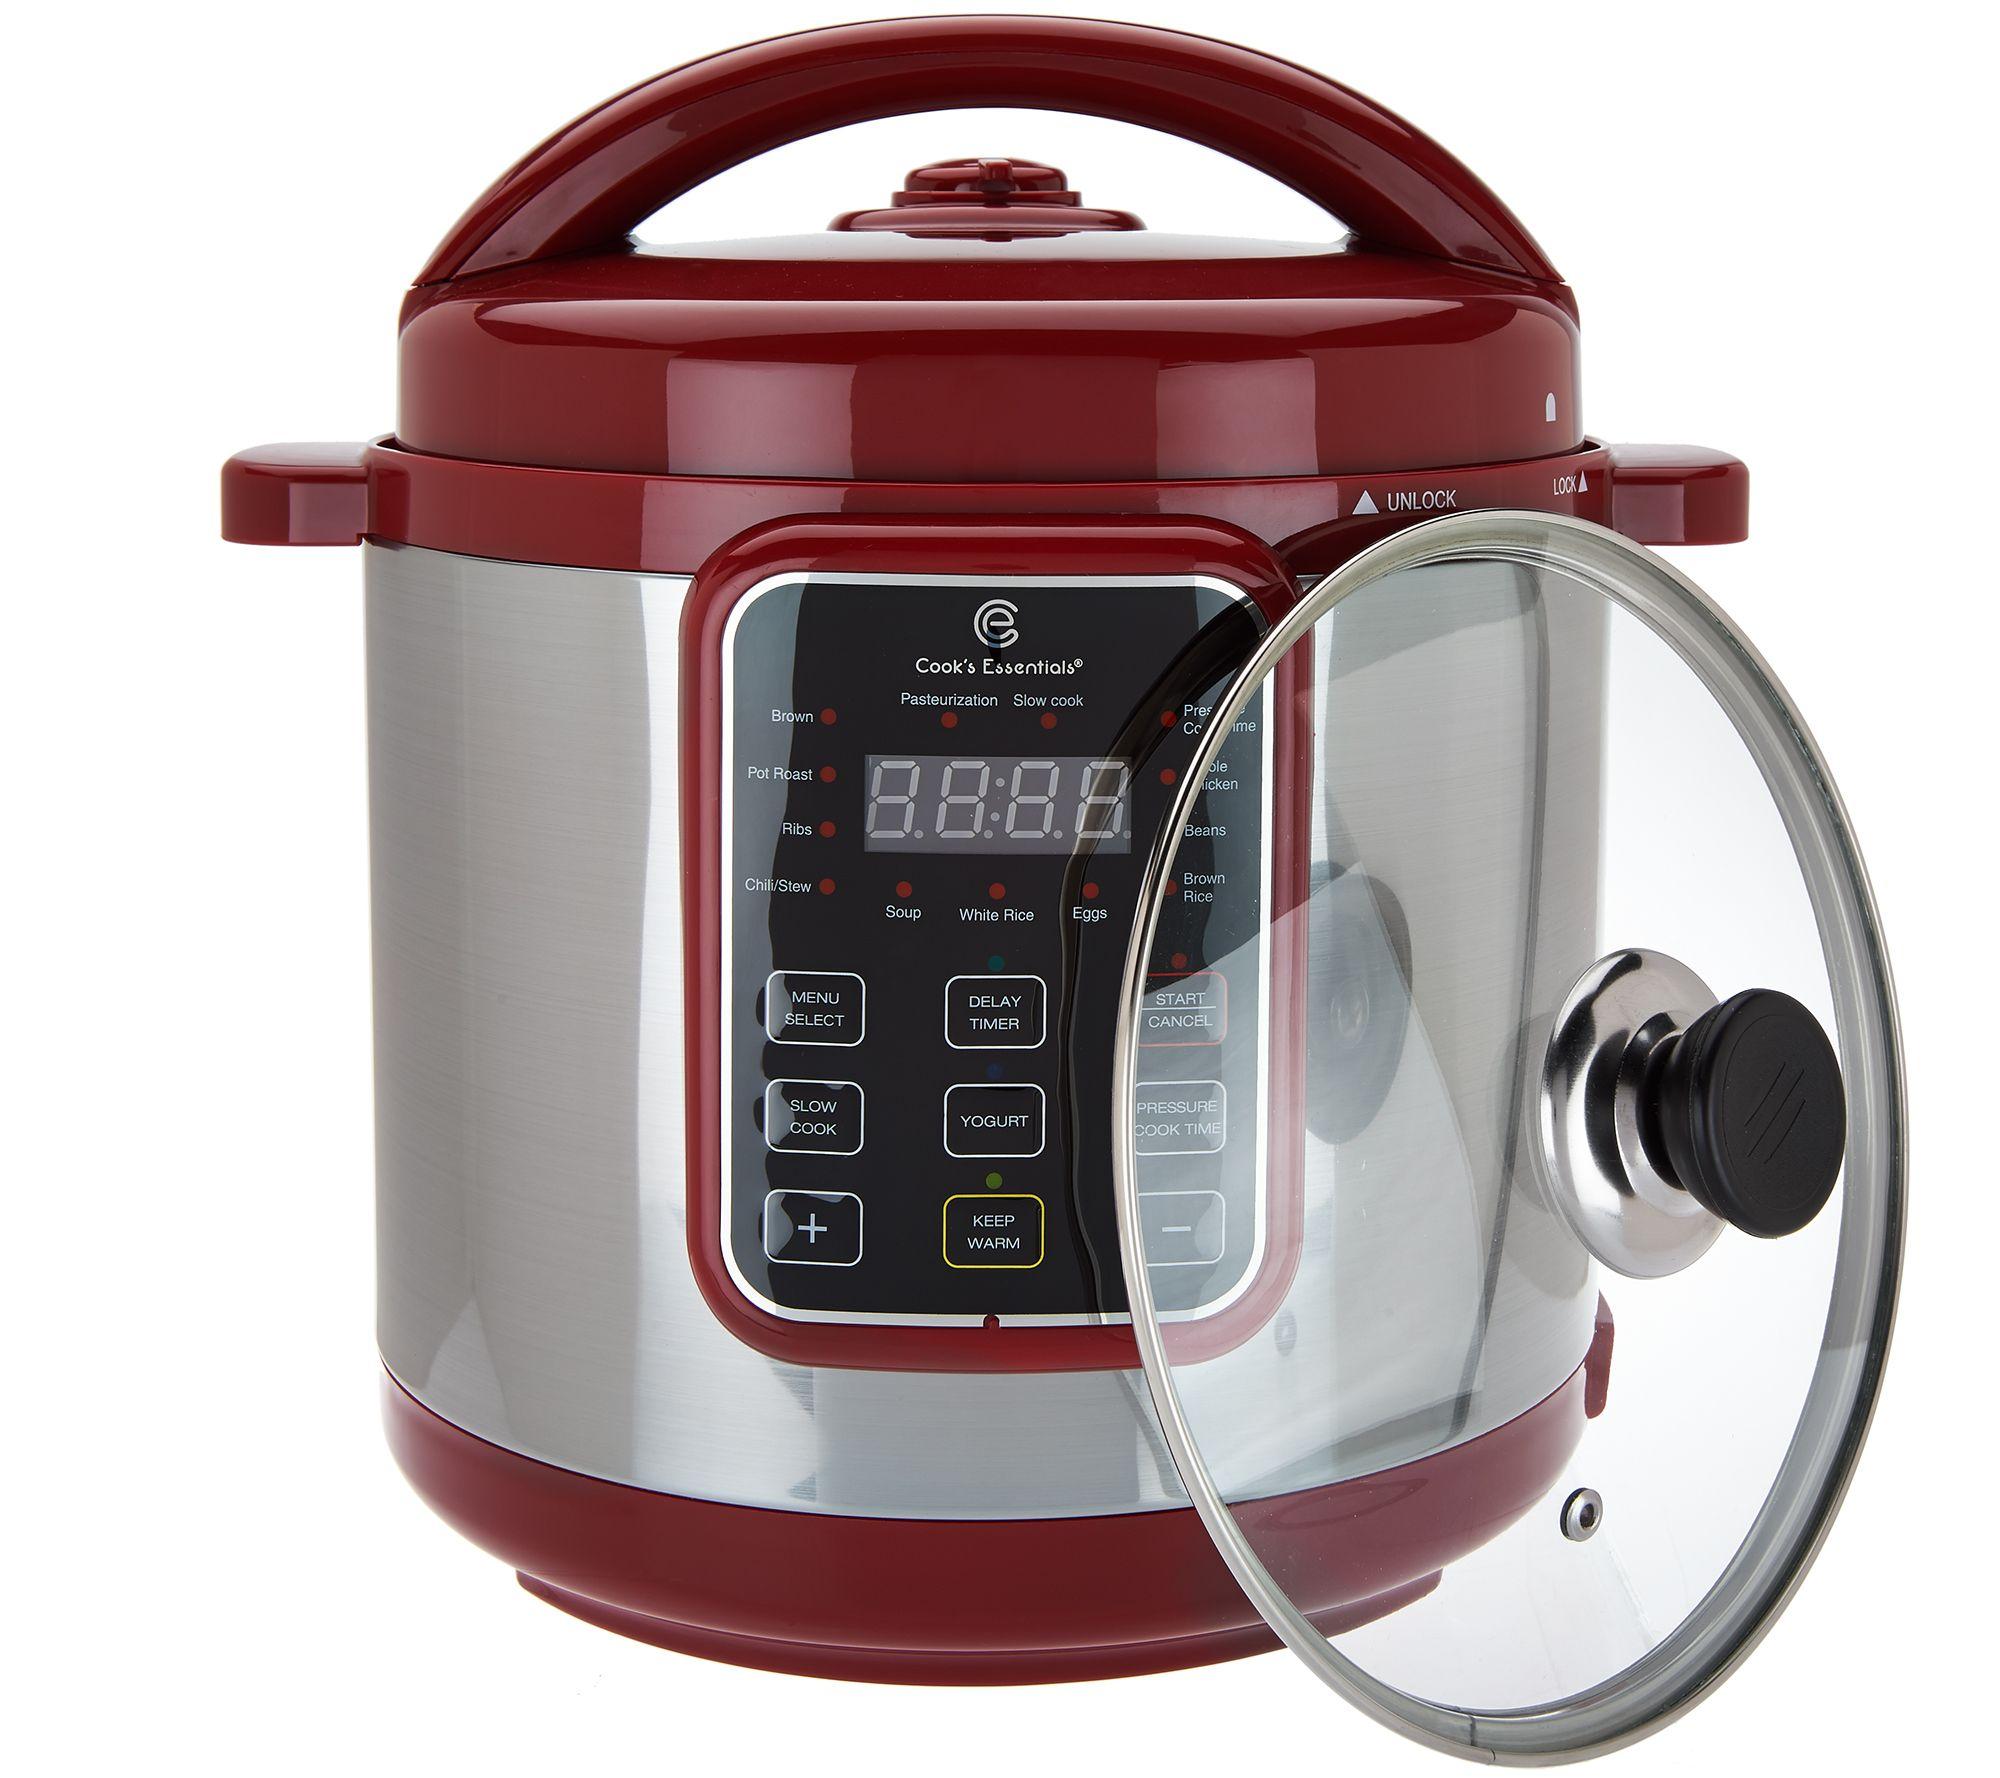 Cook's Essentials 6qt Sloped Panel Digital Pressure Cooker - Page 1 —  QVC.com